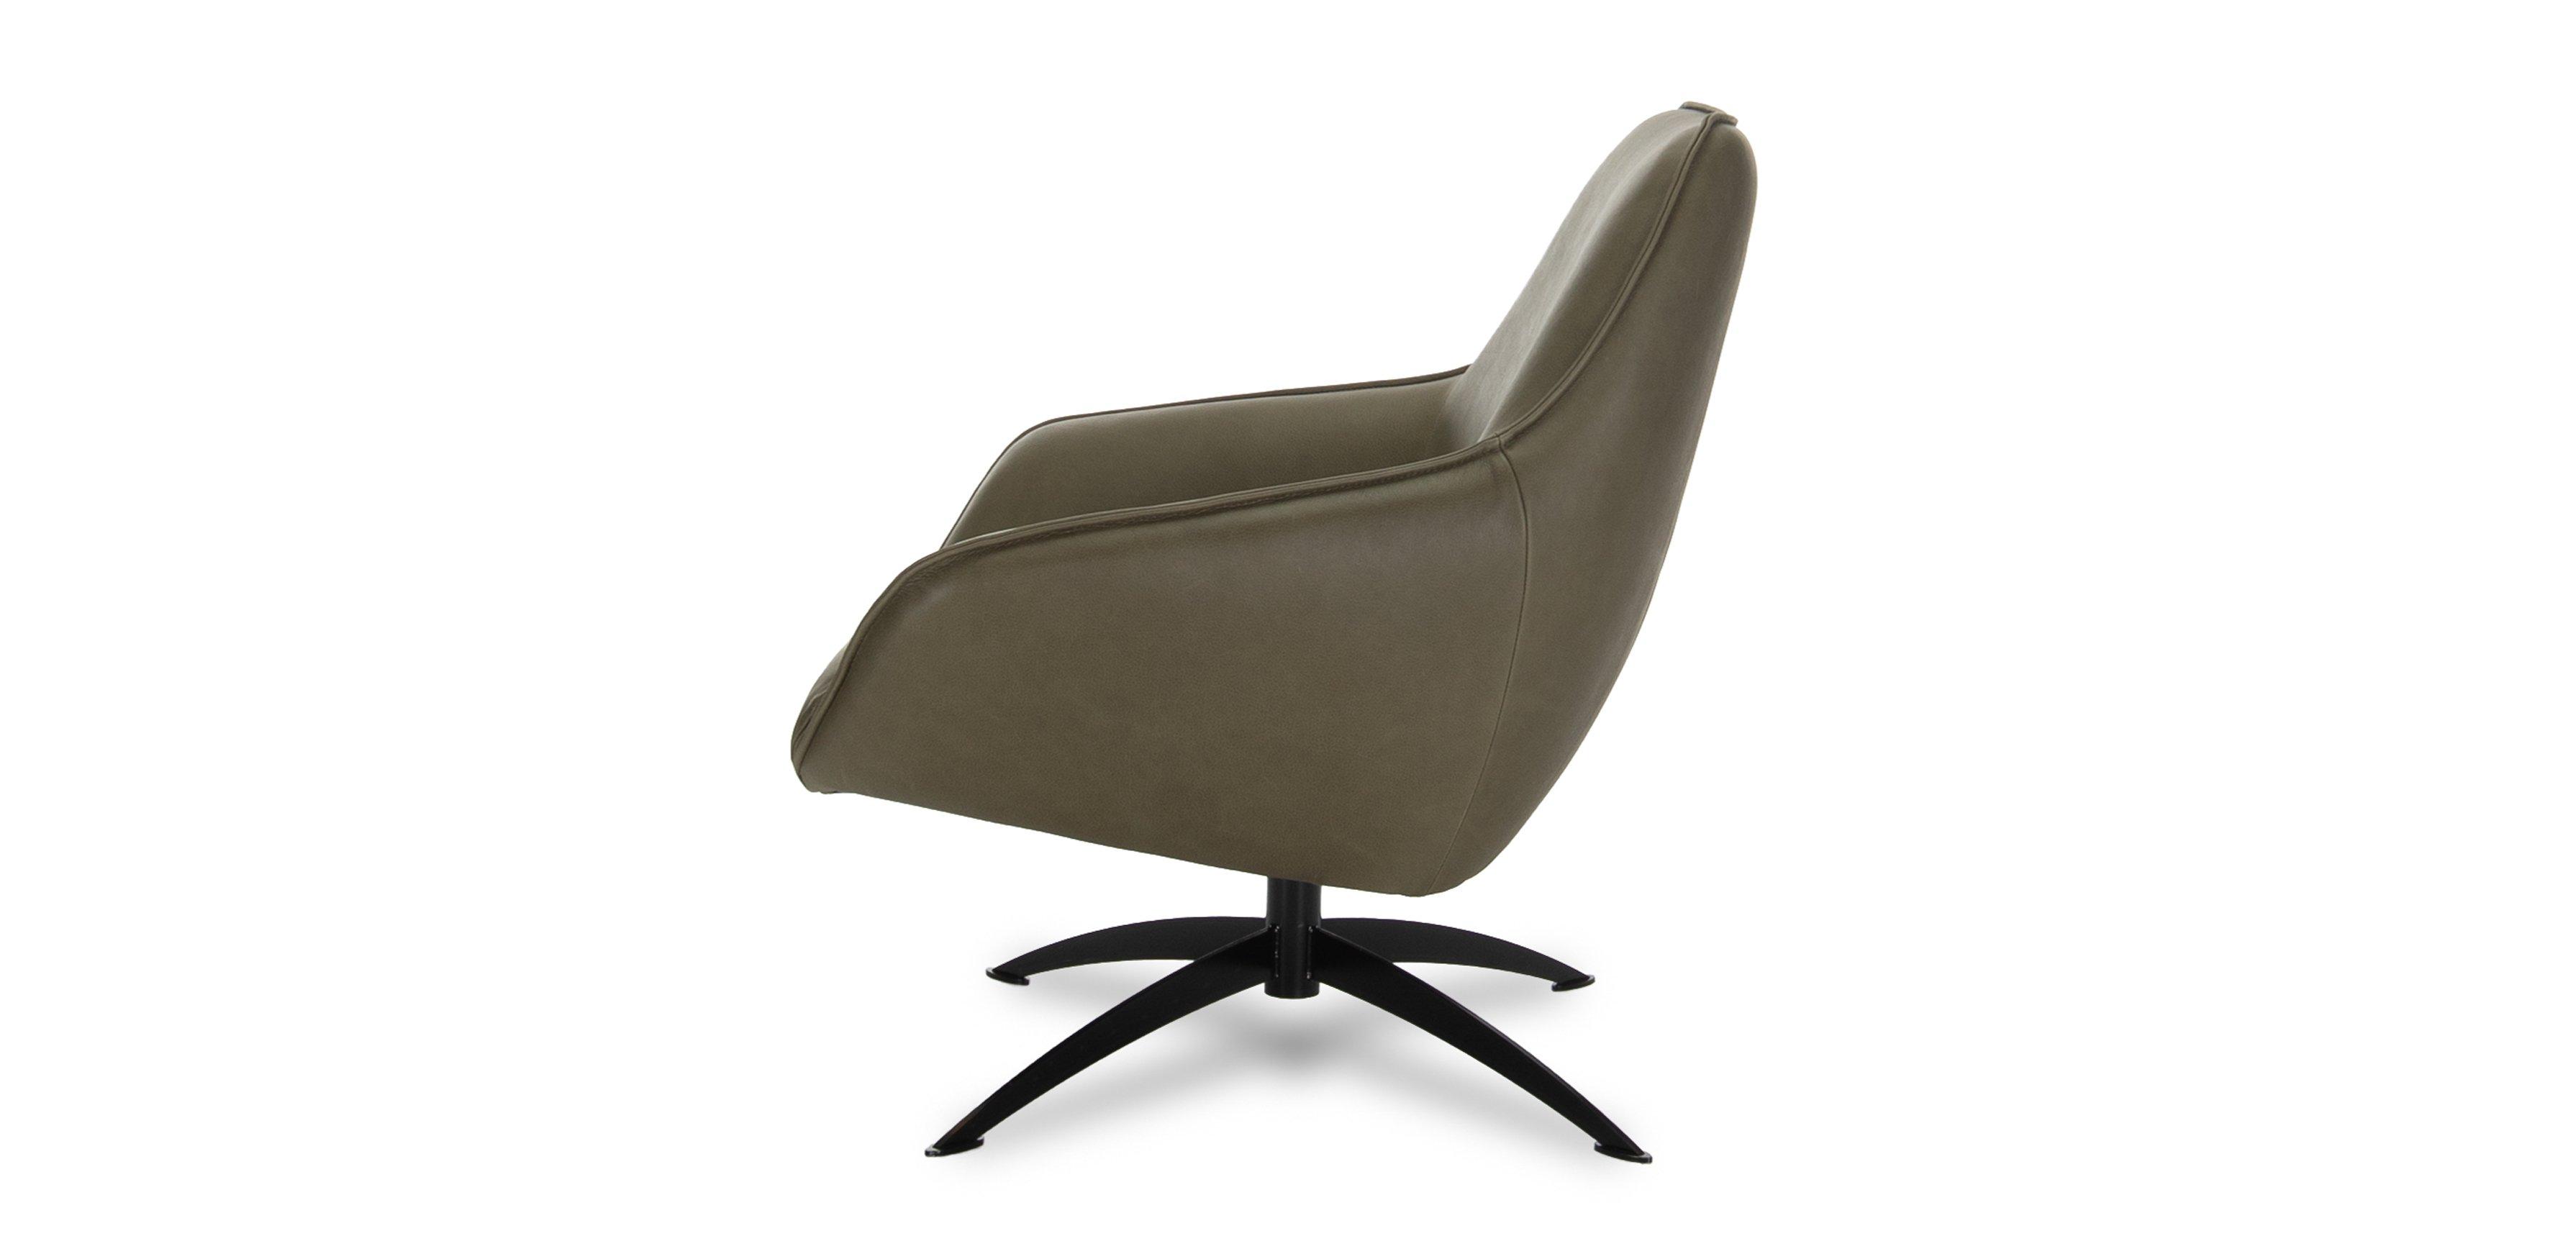 Faas fauteuil DYYK 3580x1750 leer 5